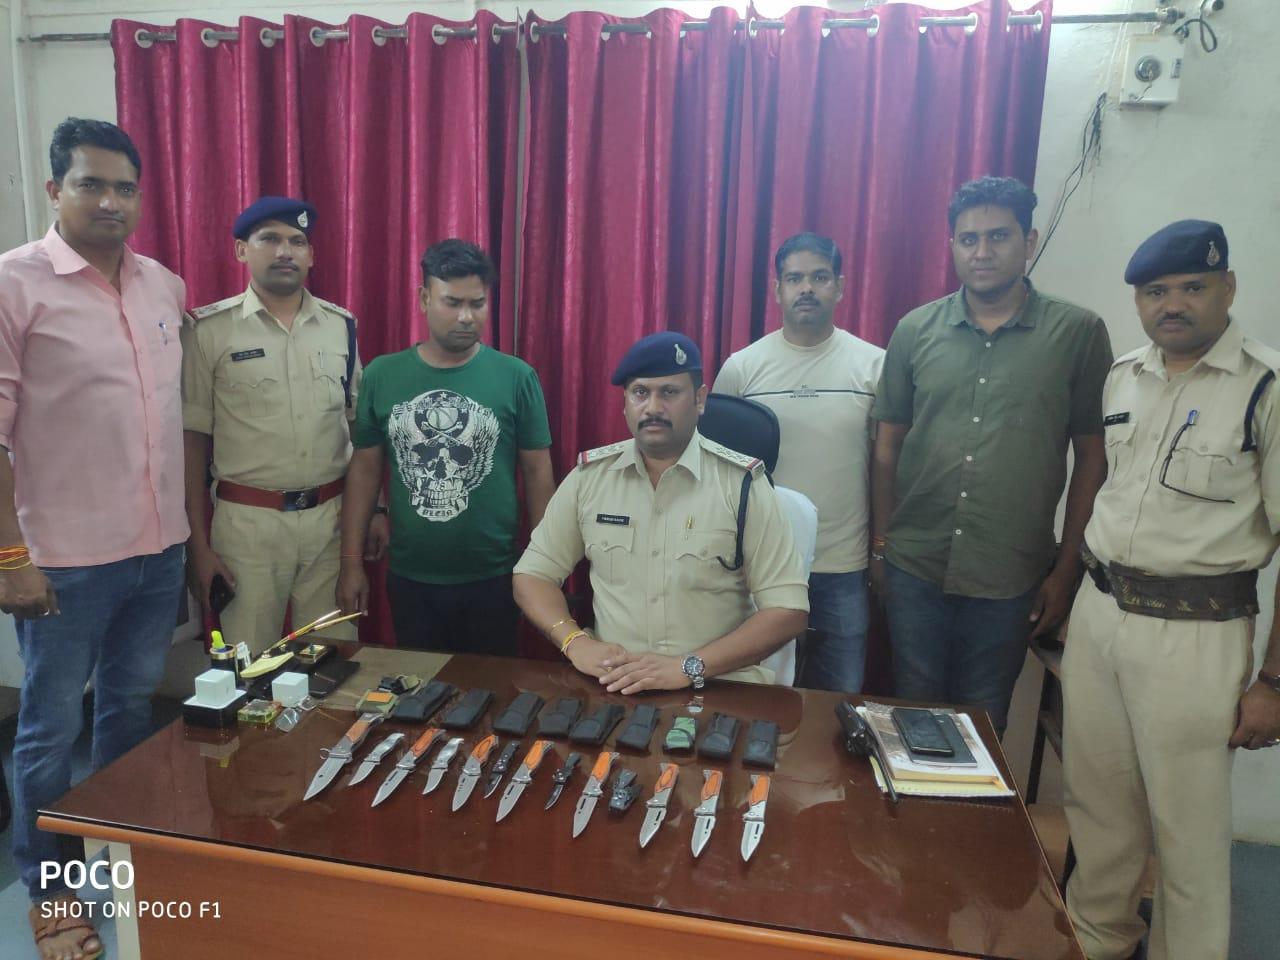 hoshangabad-accused-arrested-under-Arms-Act-कोतवाली पुलिस की कार्रवाई, आर्म्स एक्ट तहत आरोपी गिरफ्तार